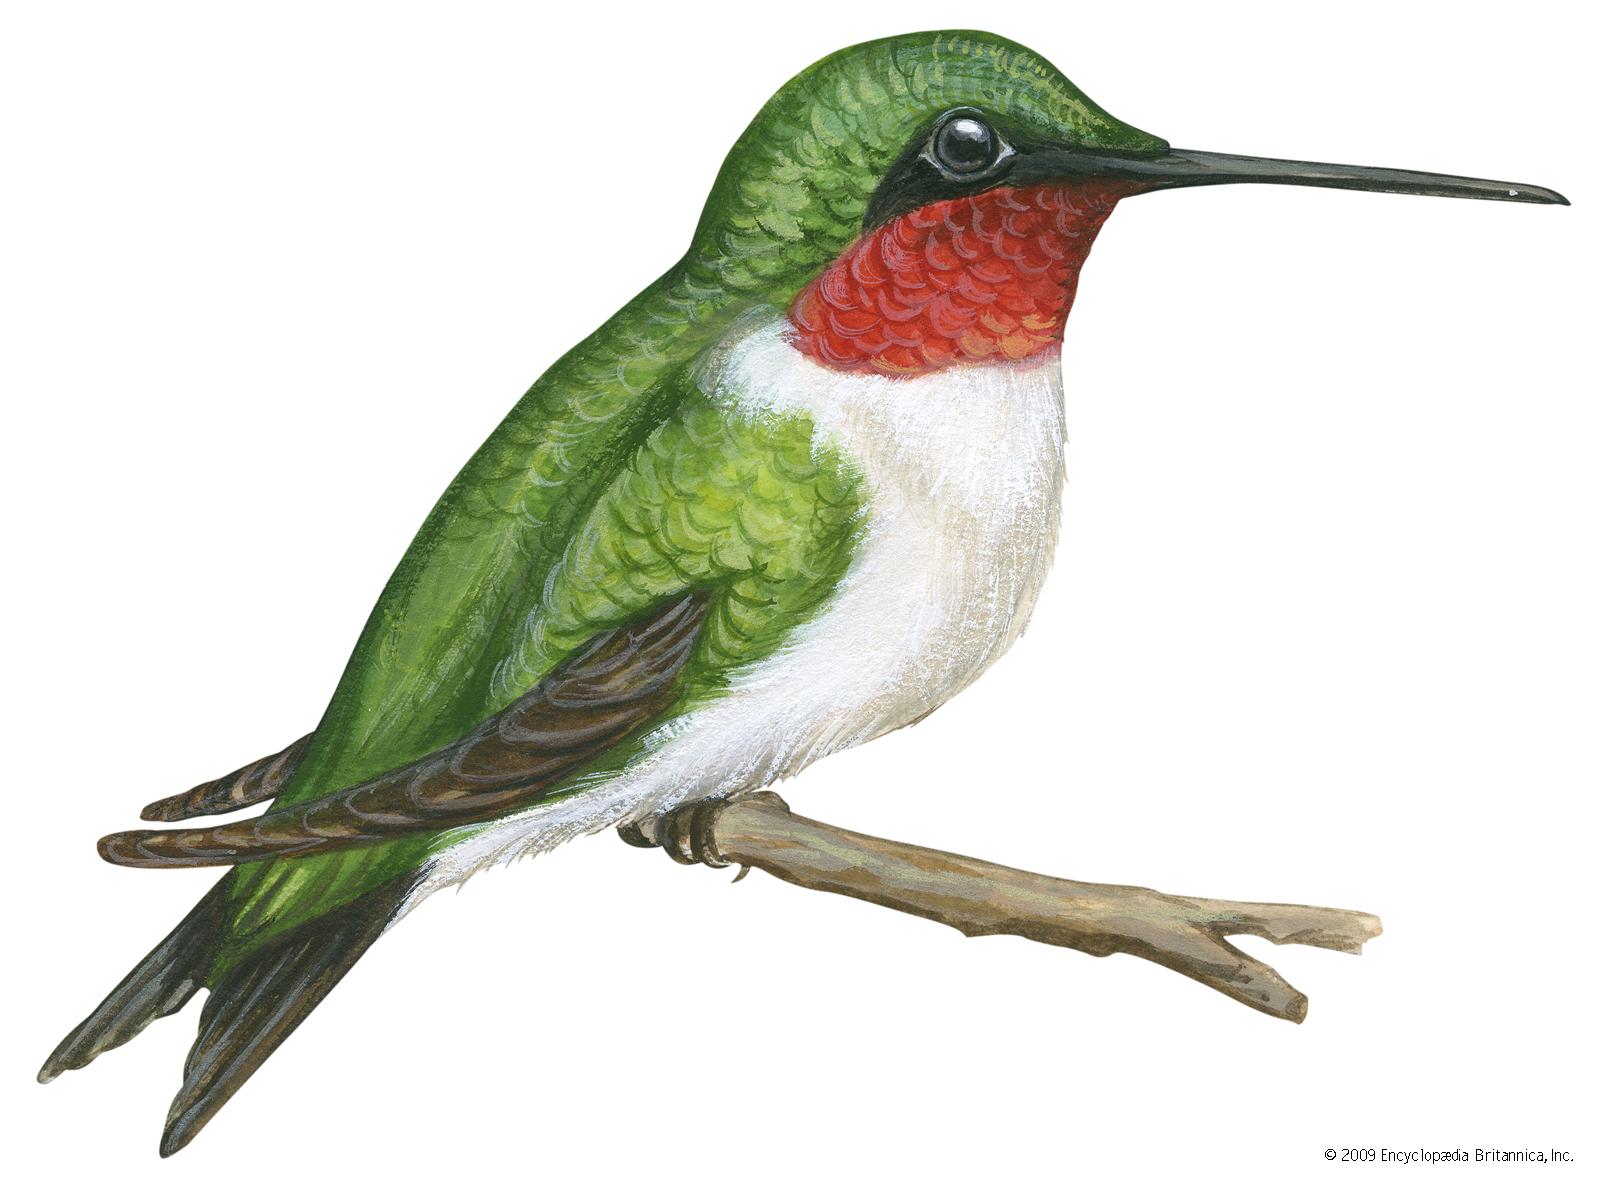 Bird britannica com . Hummingbird clipart ruby throated hummingbird